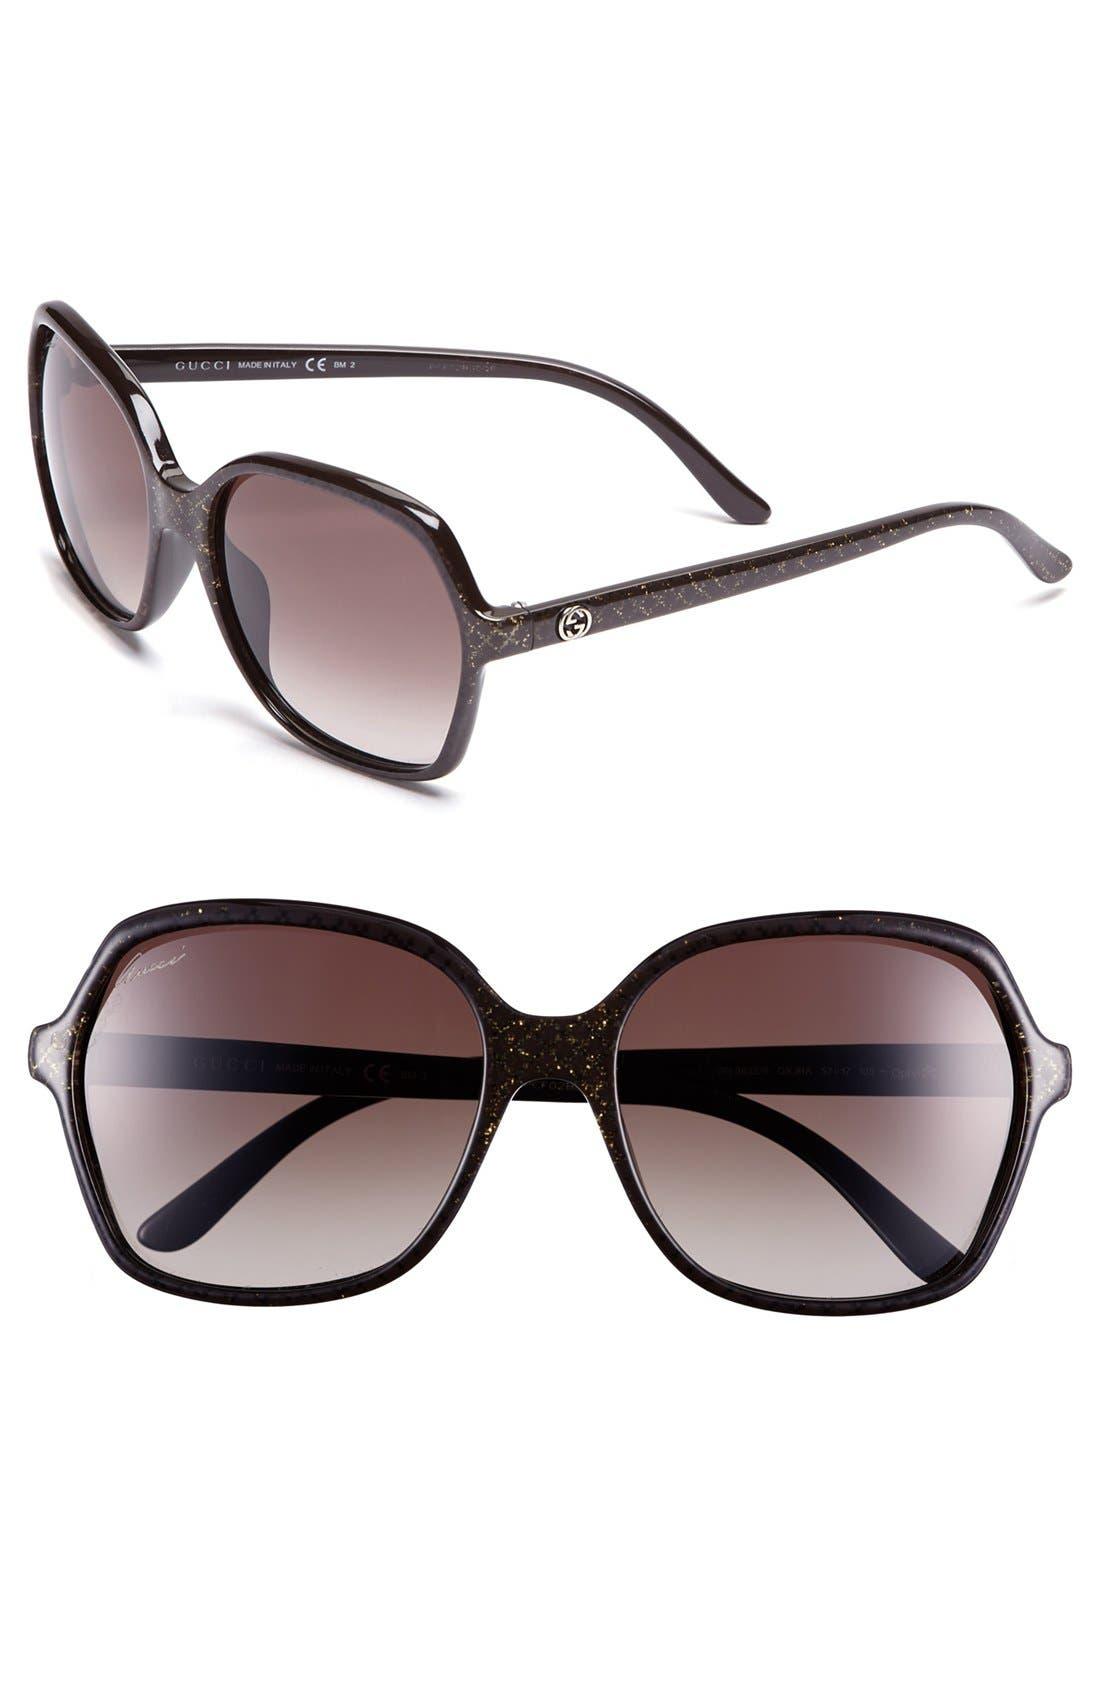 Alternate Image 1 Selected - Gucci 'Basic' 57mm Sunglasses